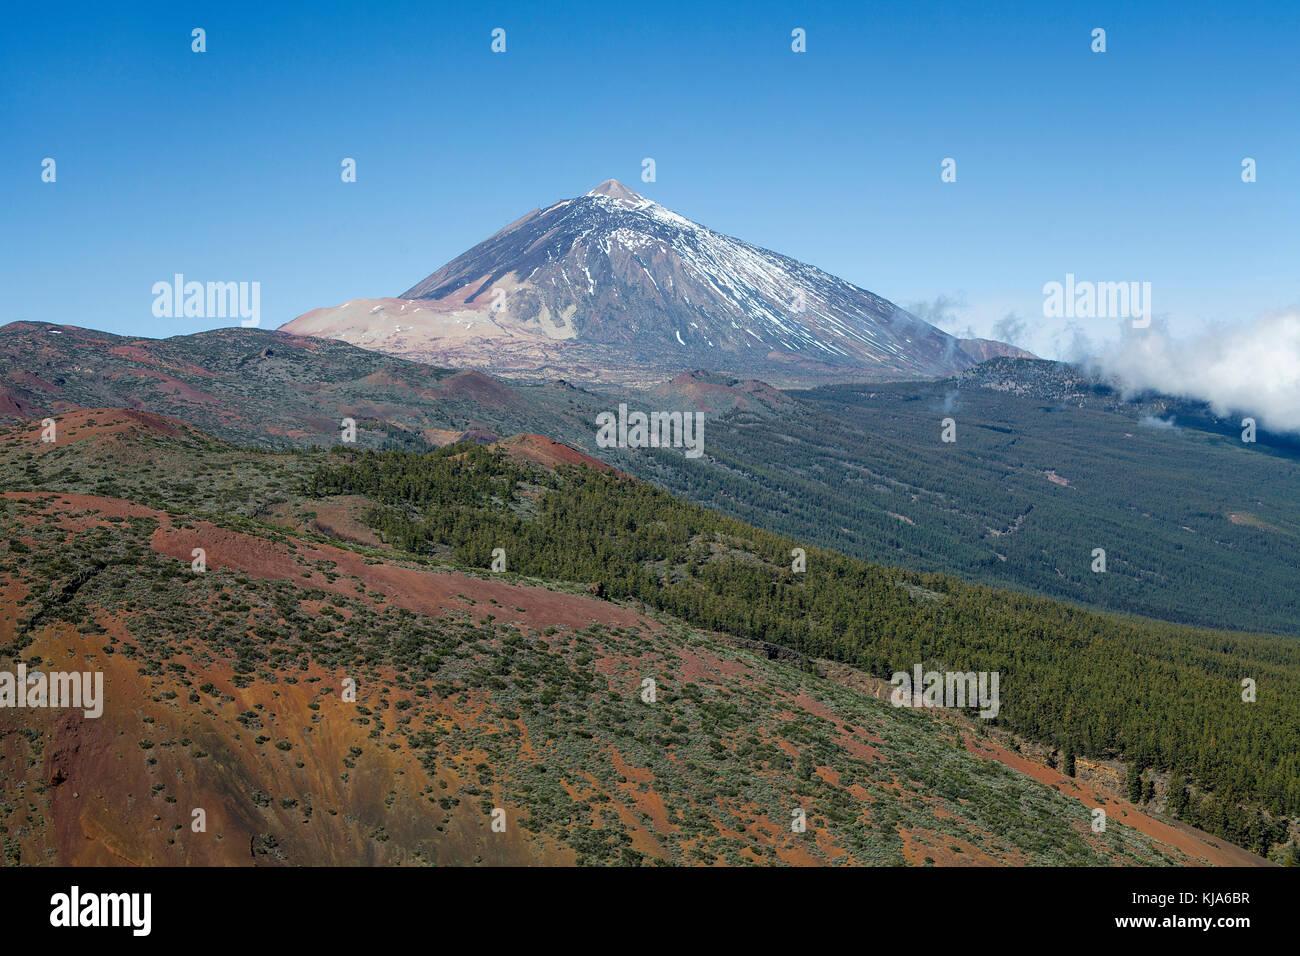 Pico del Teide, with 3718 meter highest mountain on spain territory, UNESCO world heritage site, Tenerife island, - Stock Image